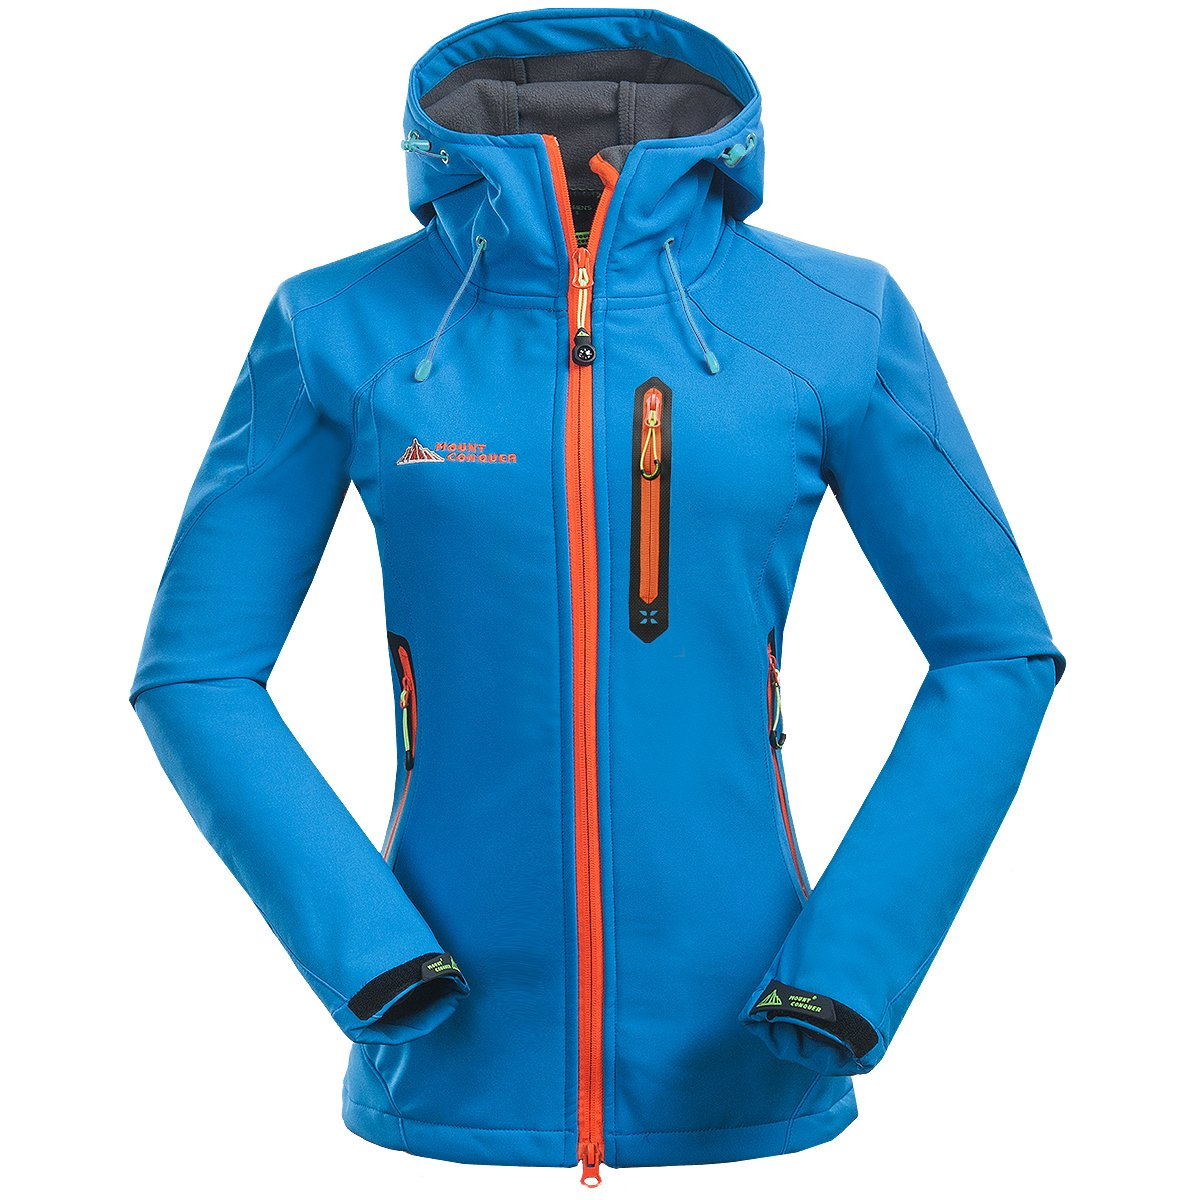 Topway Women's Softshell Water Resistant Windproof Lady Sport Hooded Jacket Coat MC15RK0203W